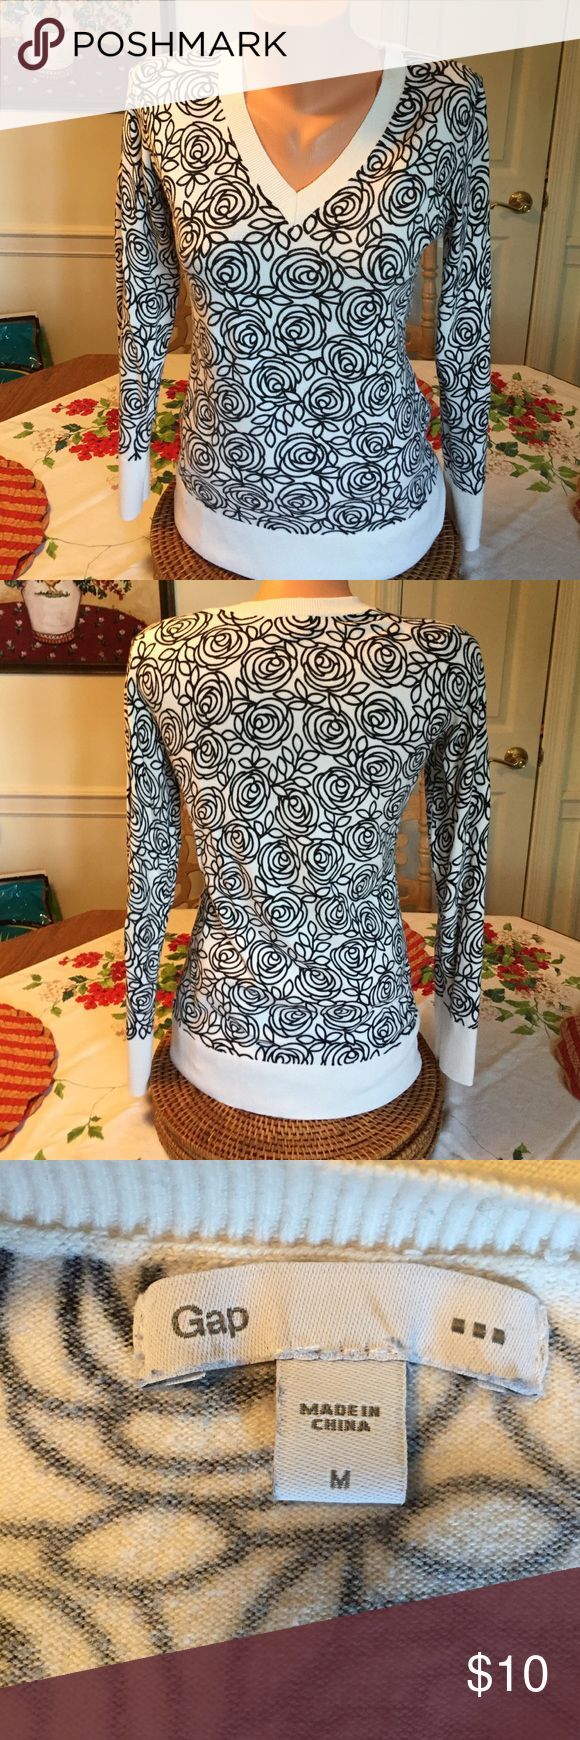 Gap Top Gap long sleeved top black and white scroll pattern. Size medium. GAP Tops Tees - Long Sleeve